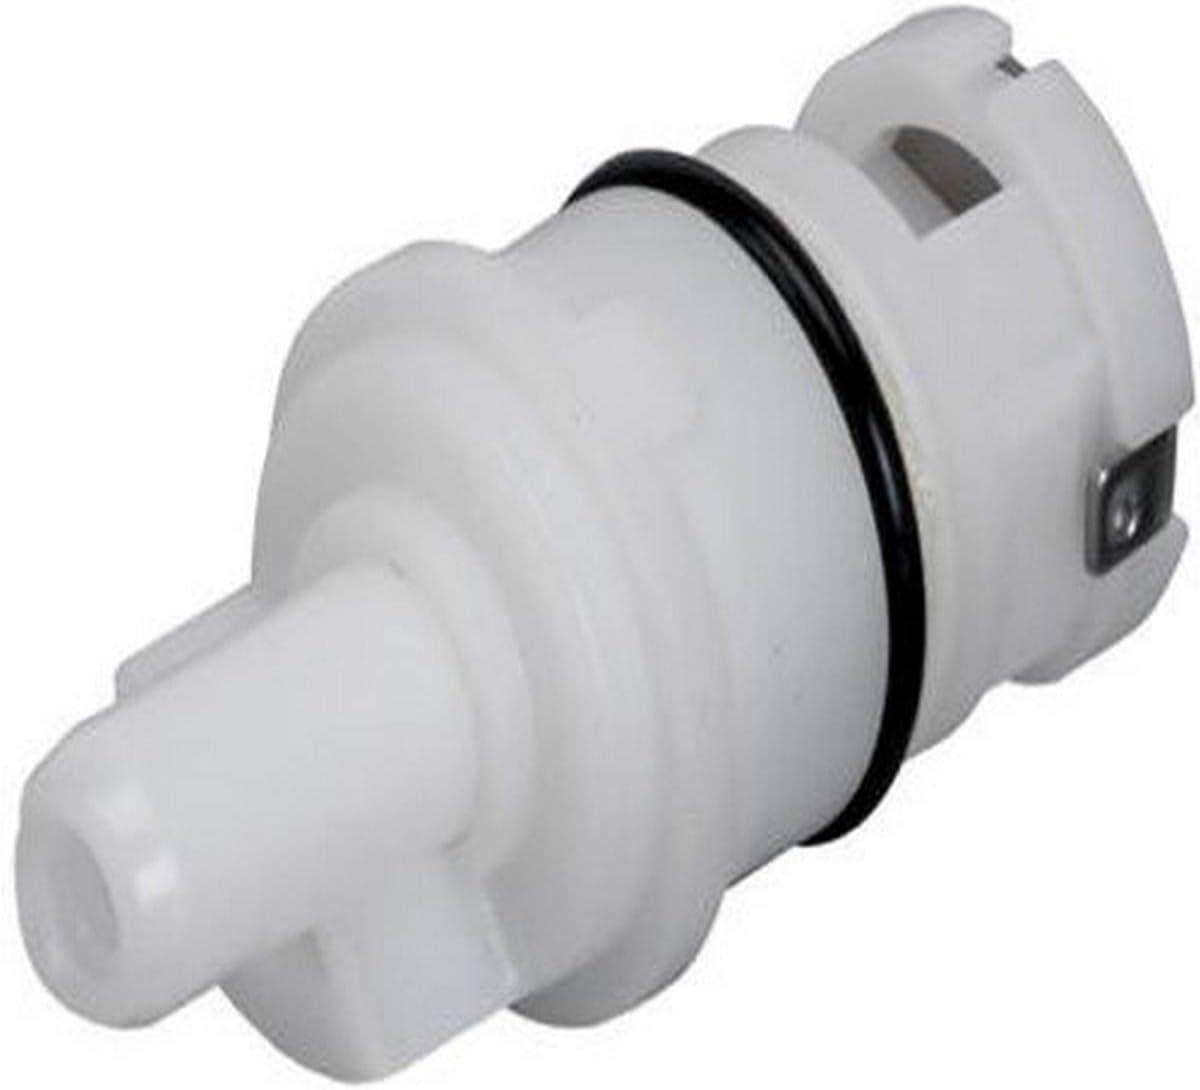 HOMEWERKS WORLDWIDE 31-210-BP BayPointe H//C Faucet Cartridge TV Non-Branded Items Home Improvement